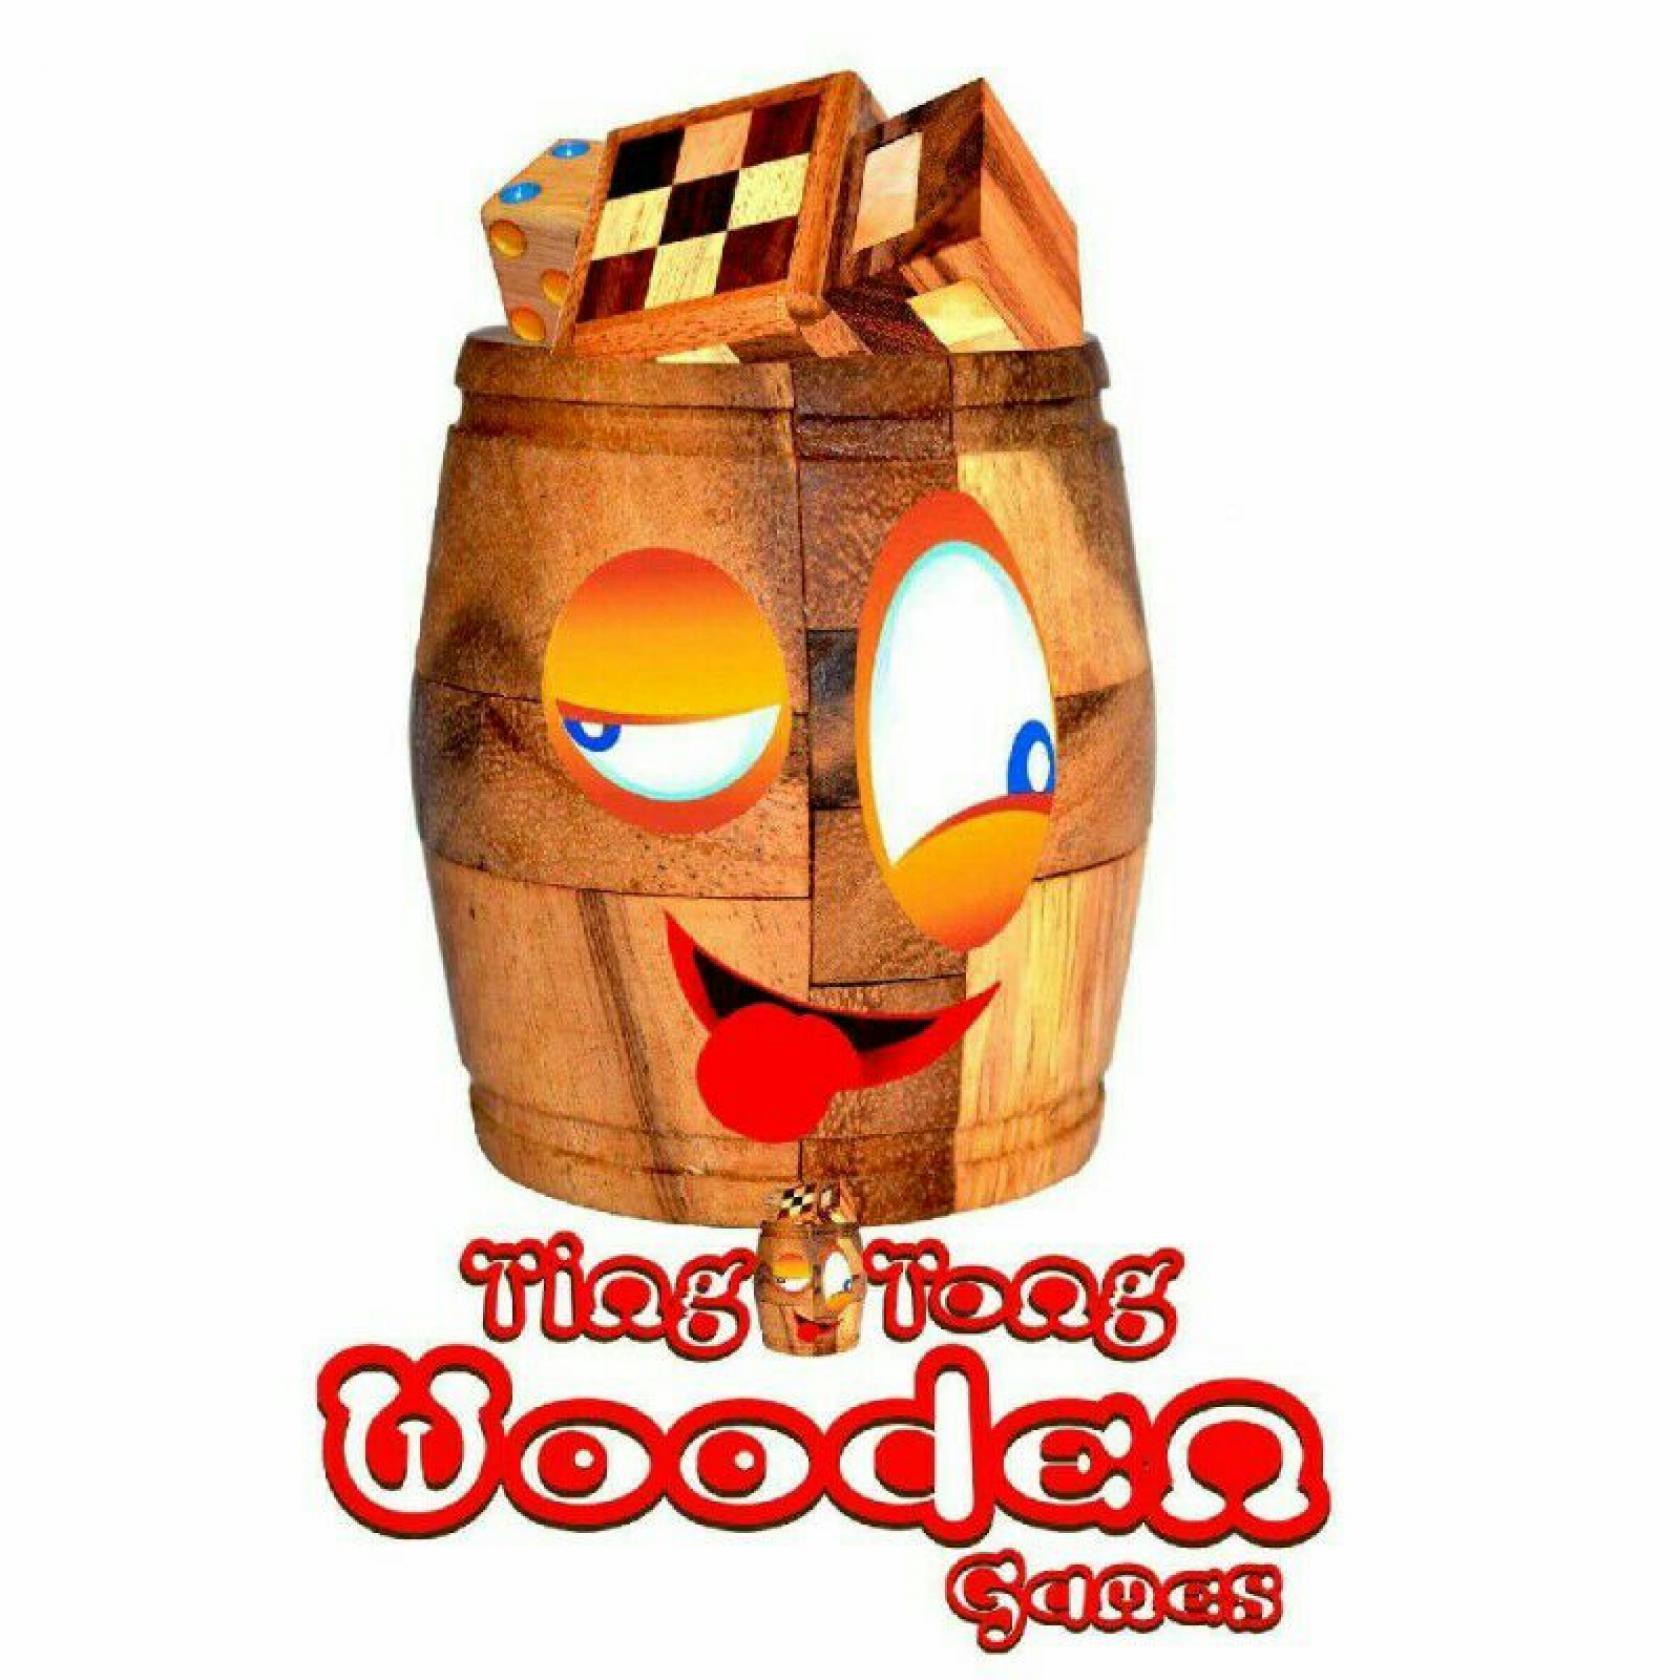 Ting Tong Wooden